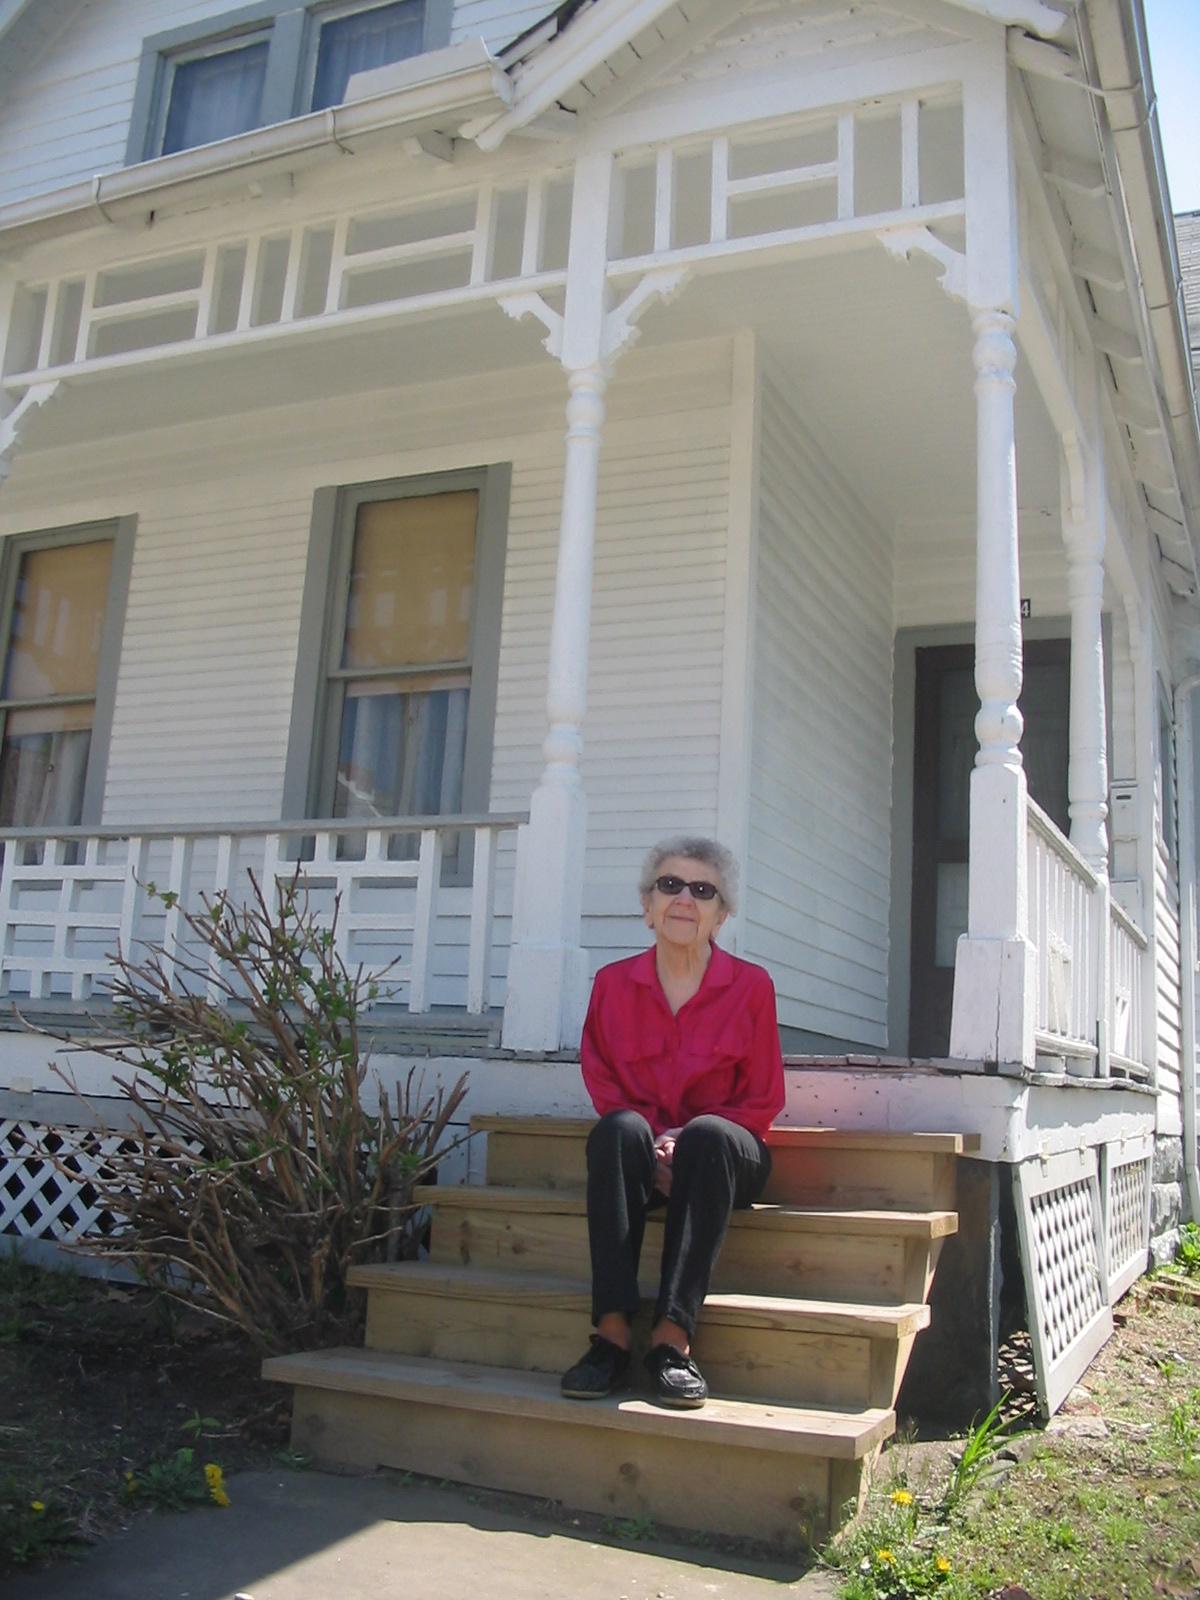 Long time residents - Lifelong friends